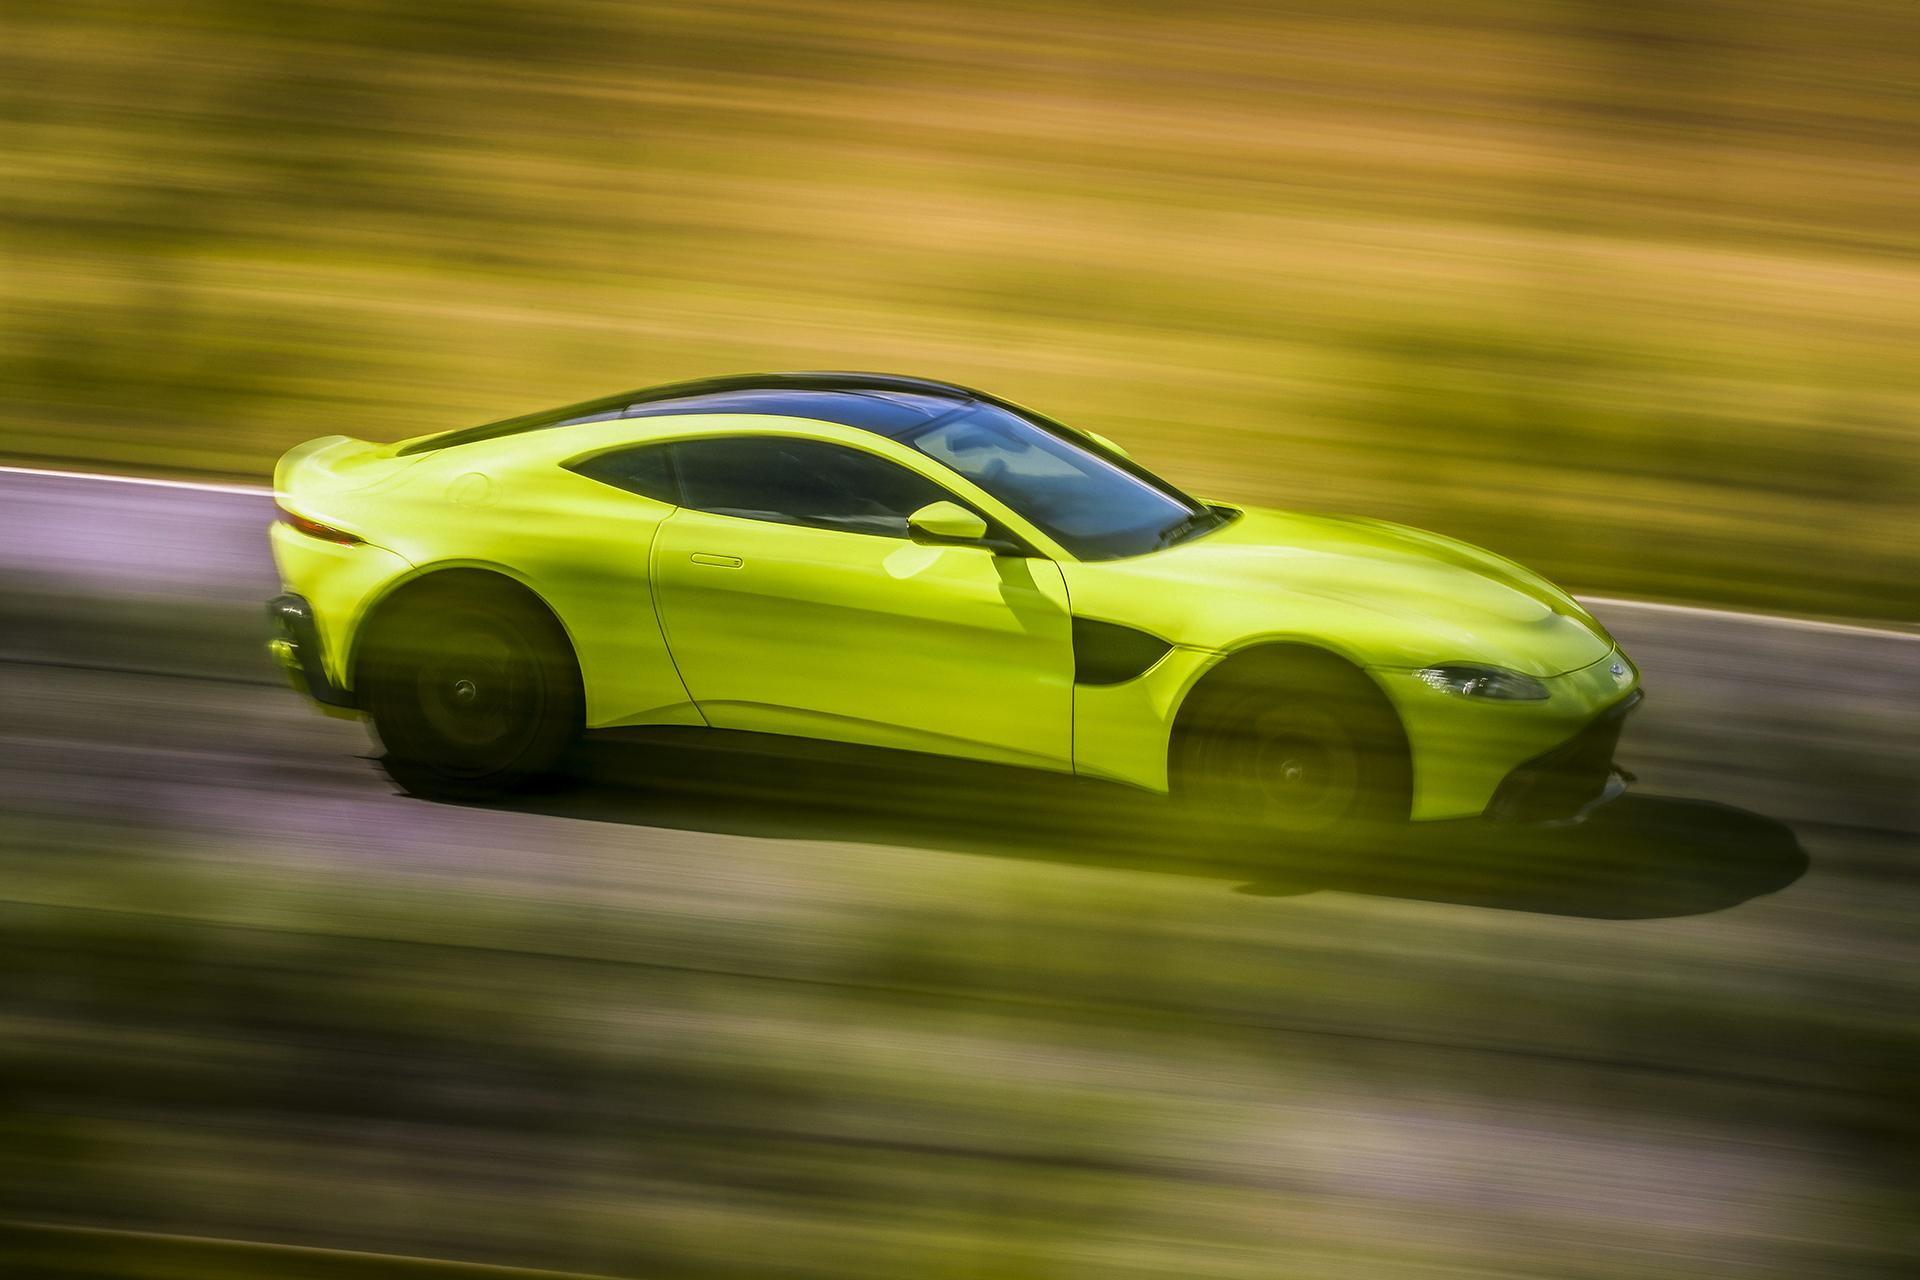 Aston Martin Lagonda Limited